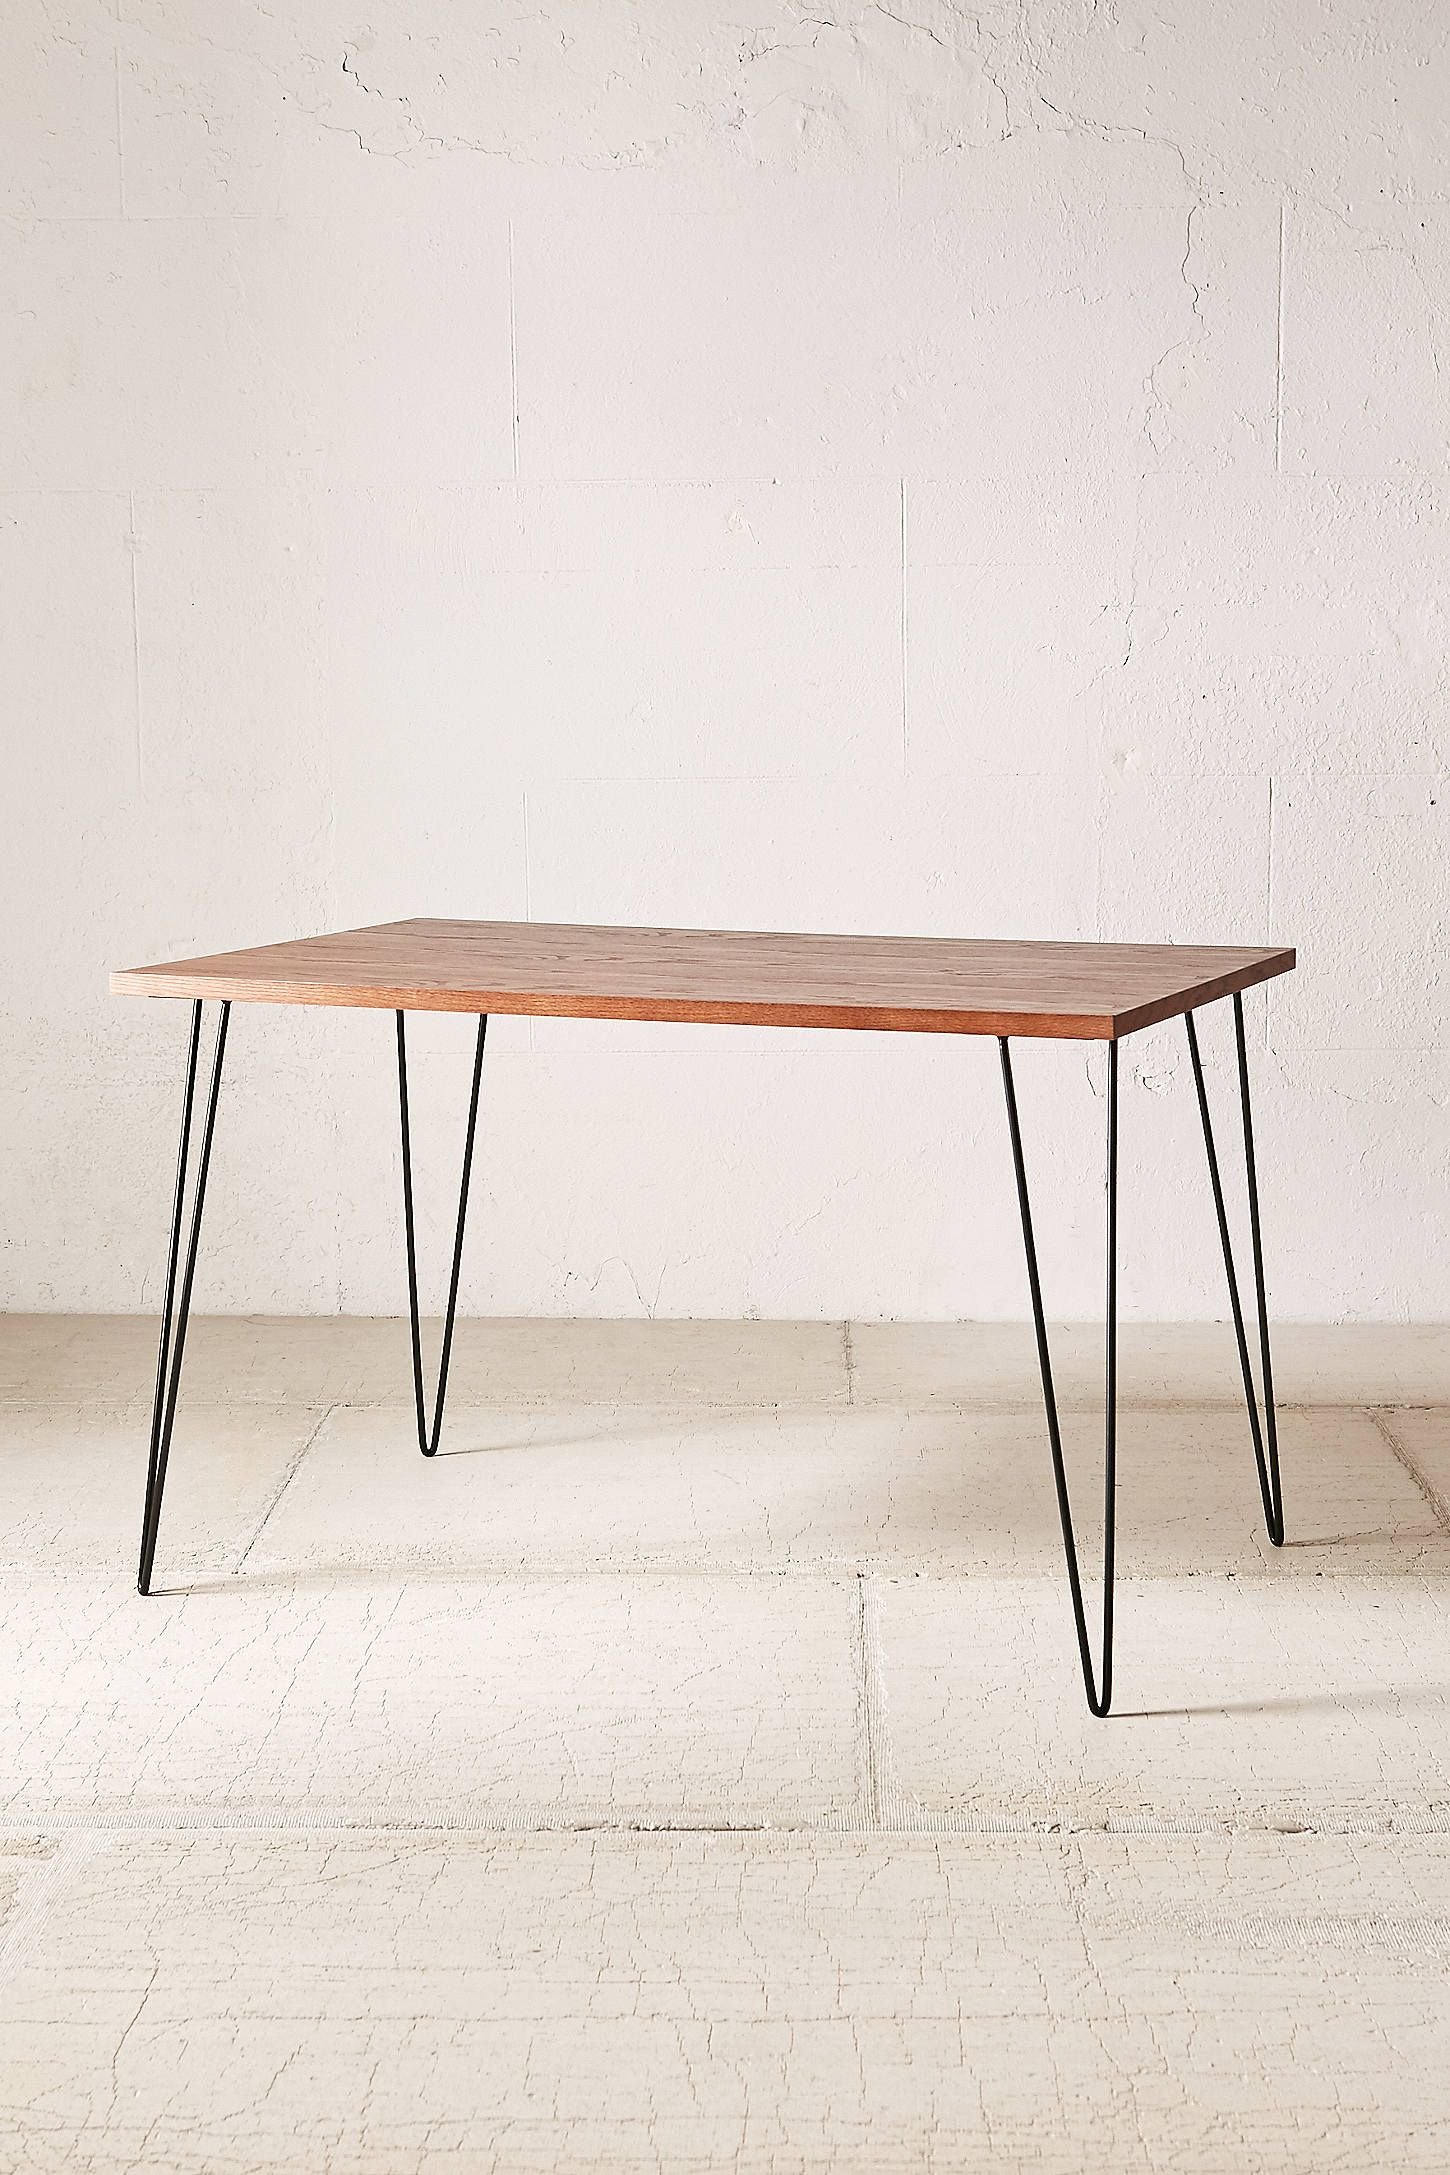 05700b562139f25c3ae3a3805804aaff Impressionnant De Table Transformable Concept